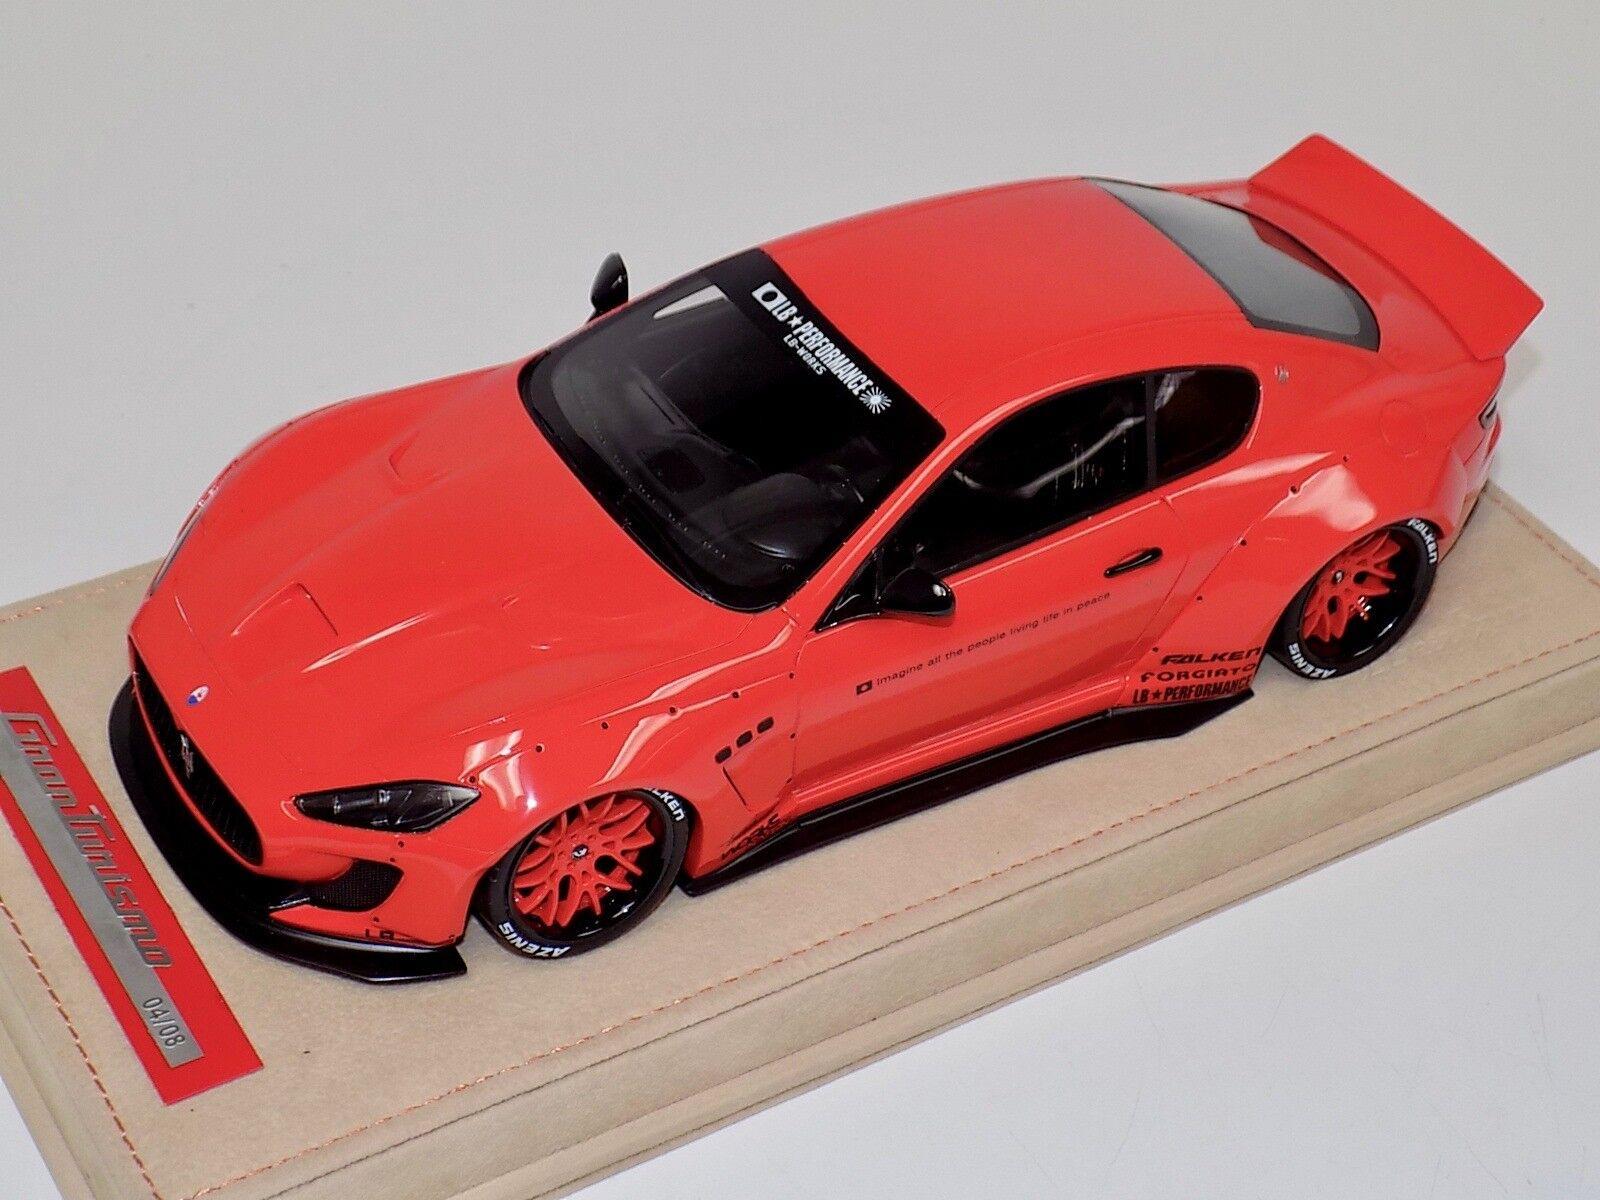 1/18 AB Models Maserati Granturismo Liberty walk Red Red Wheels Alcantara Base